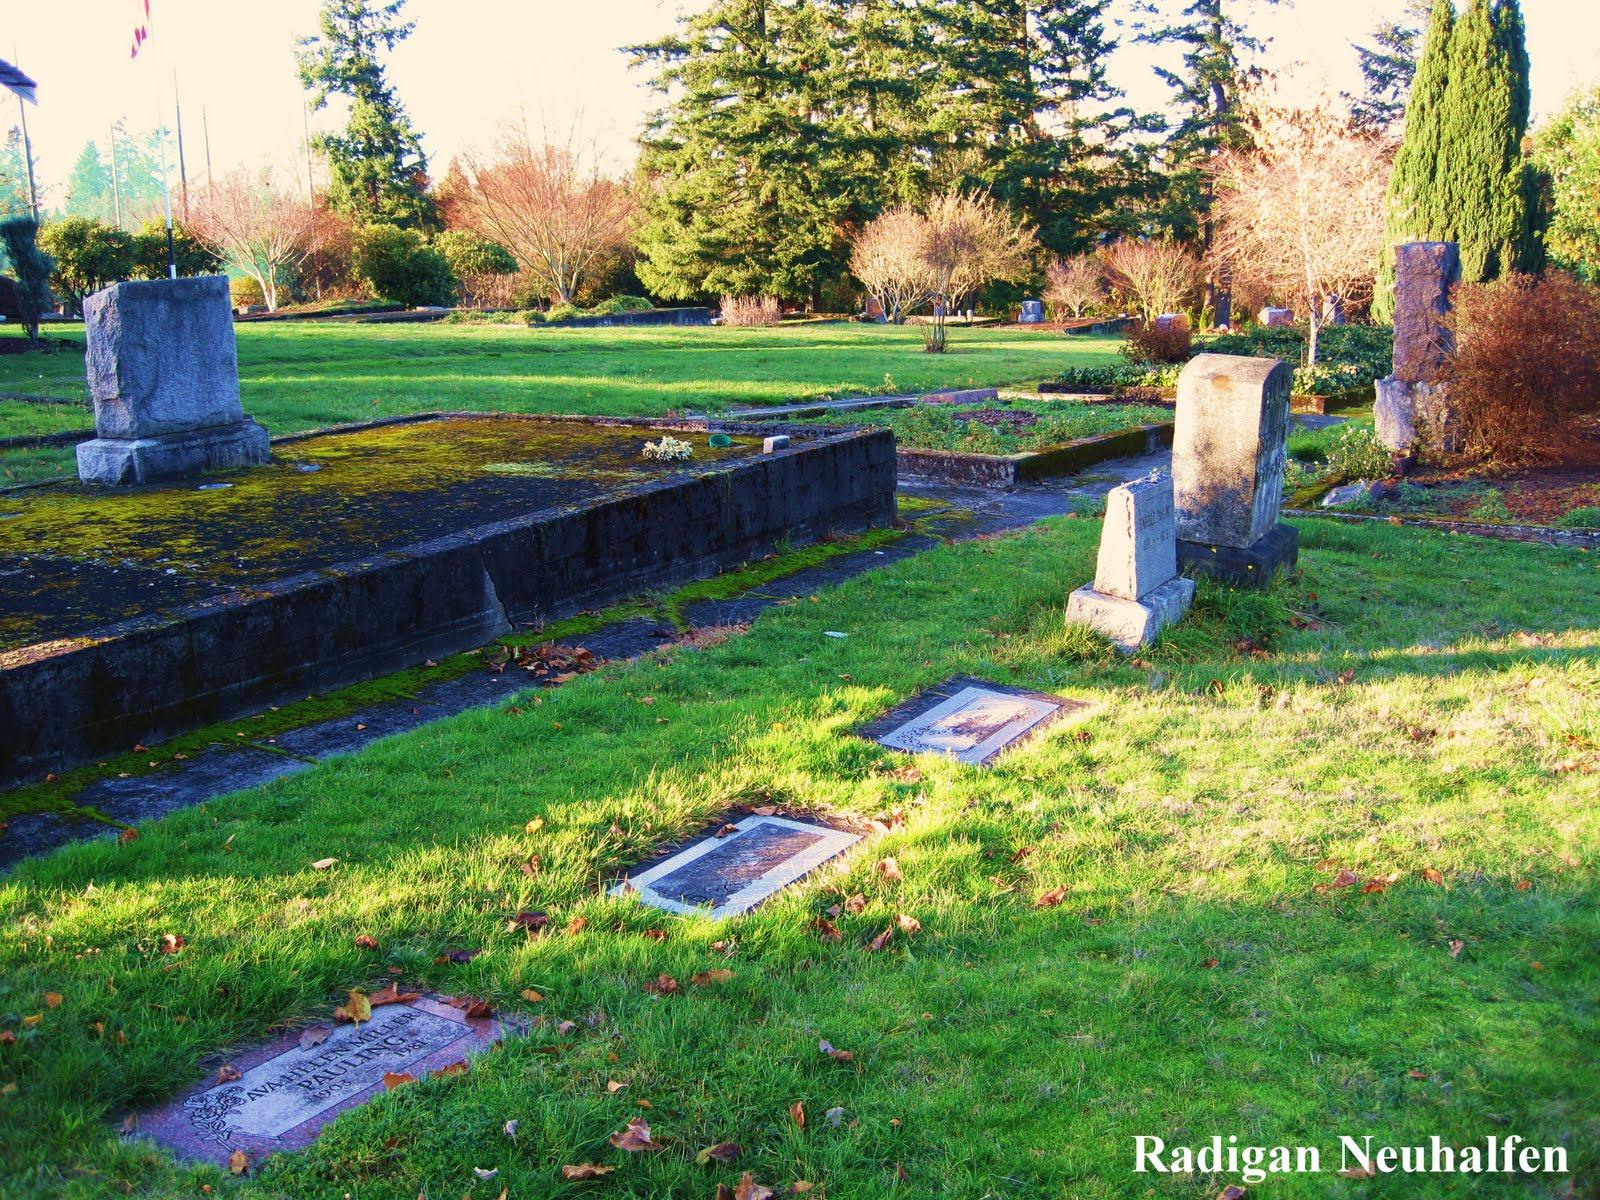 [2009+November+29+USA+Oregon+Lake+Oswego+Oswego+Pioneer+Cemetery+Linus+Pauling+grave+10.JPG]